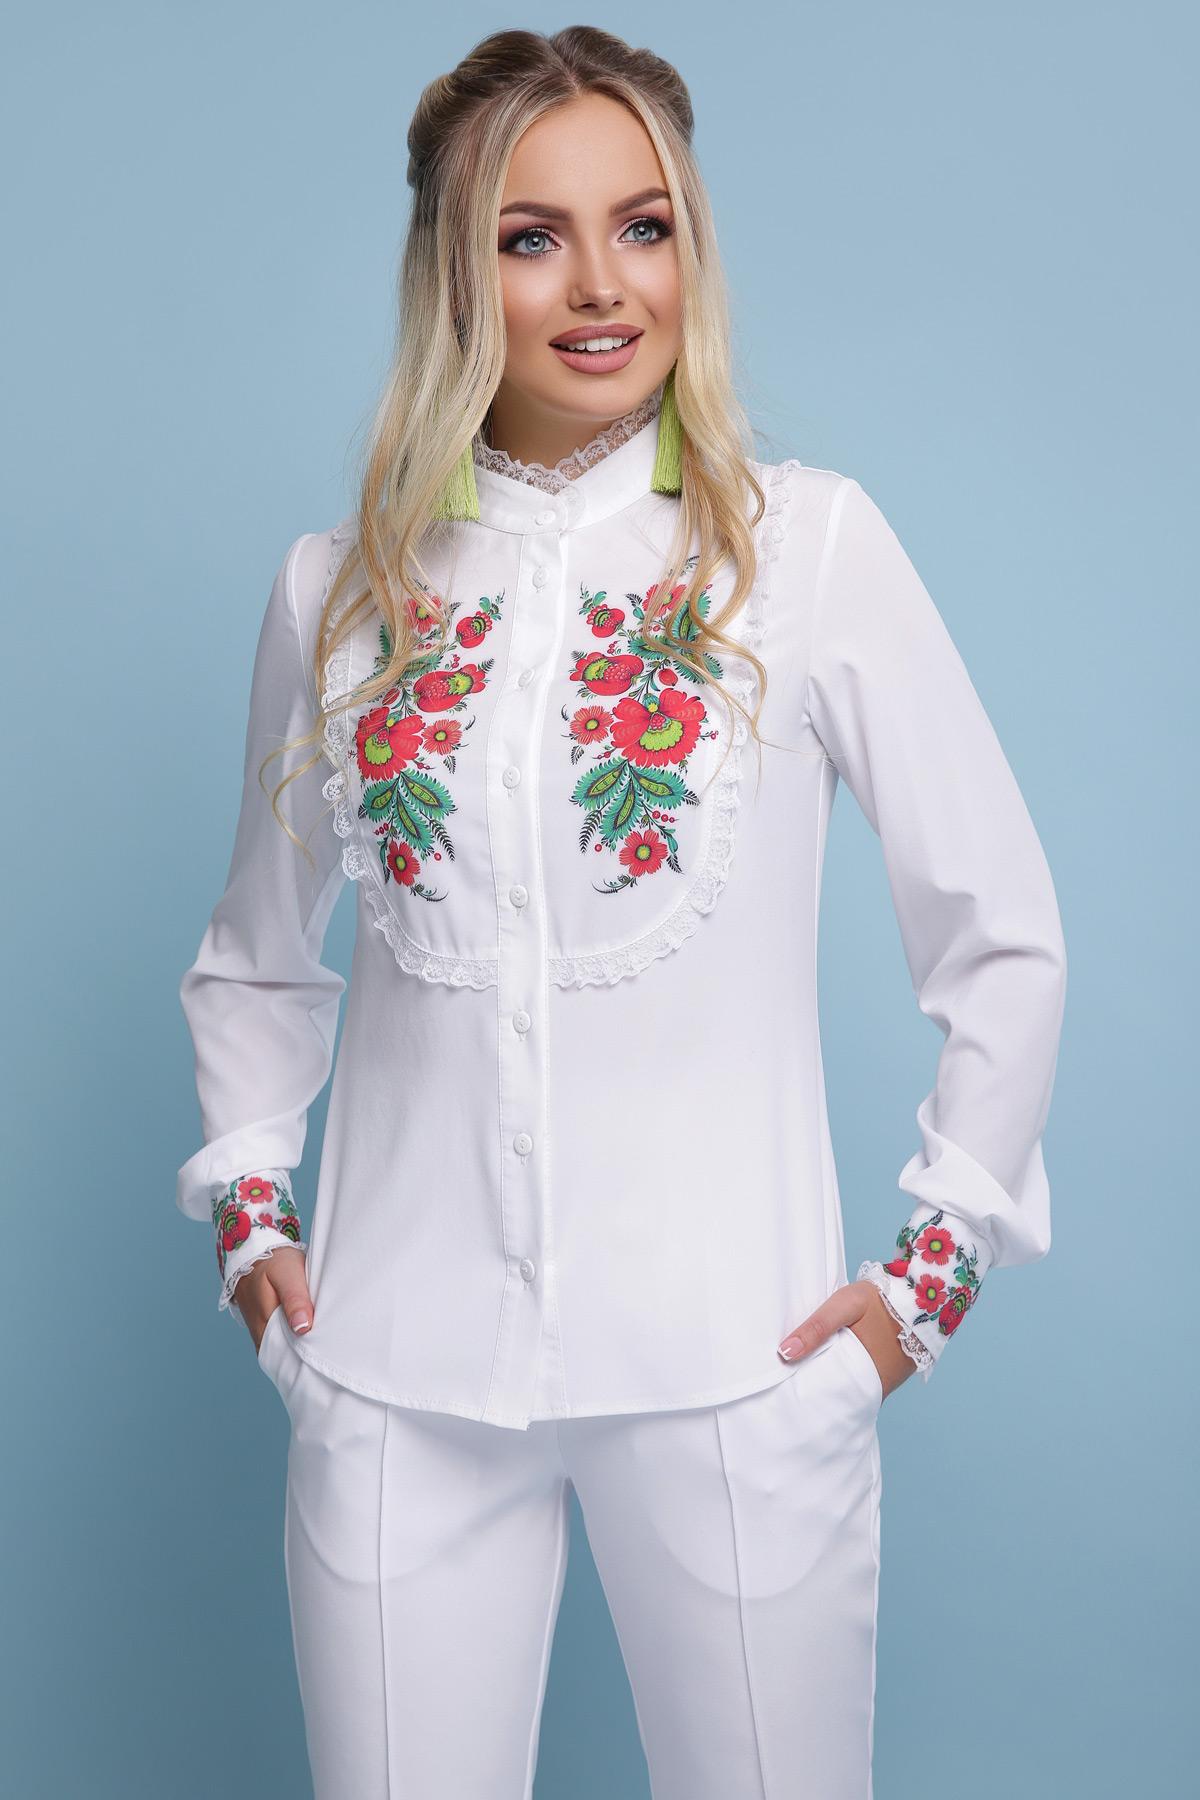 012011fcc09c48 Біла блуза з малюнком Дарина | DeDe